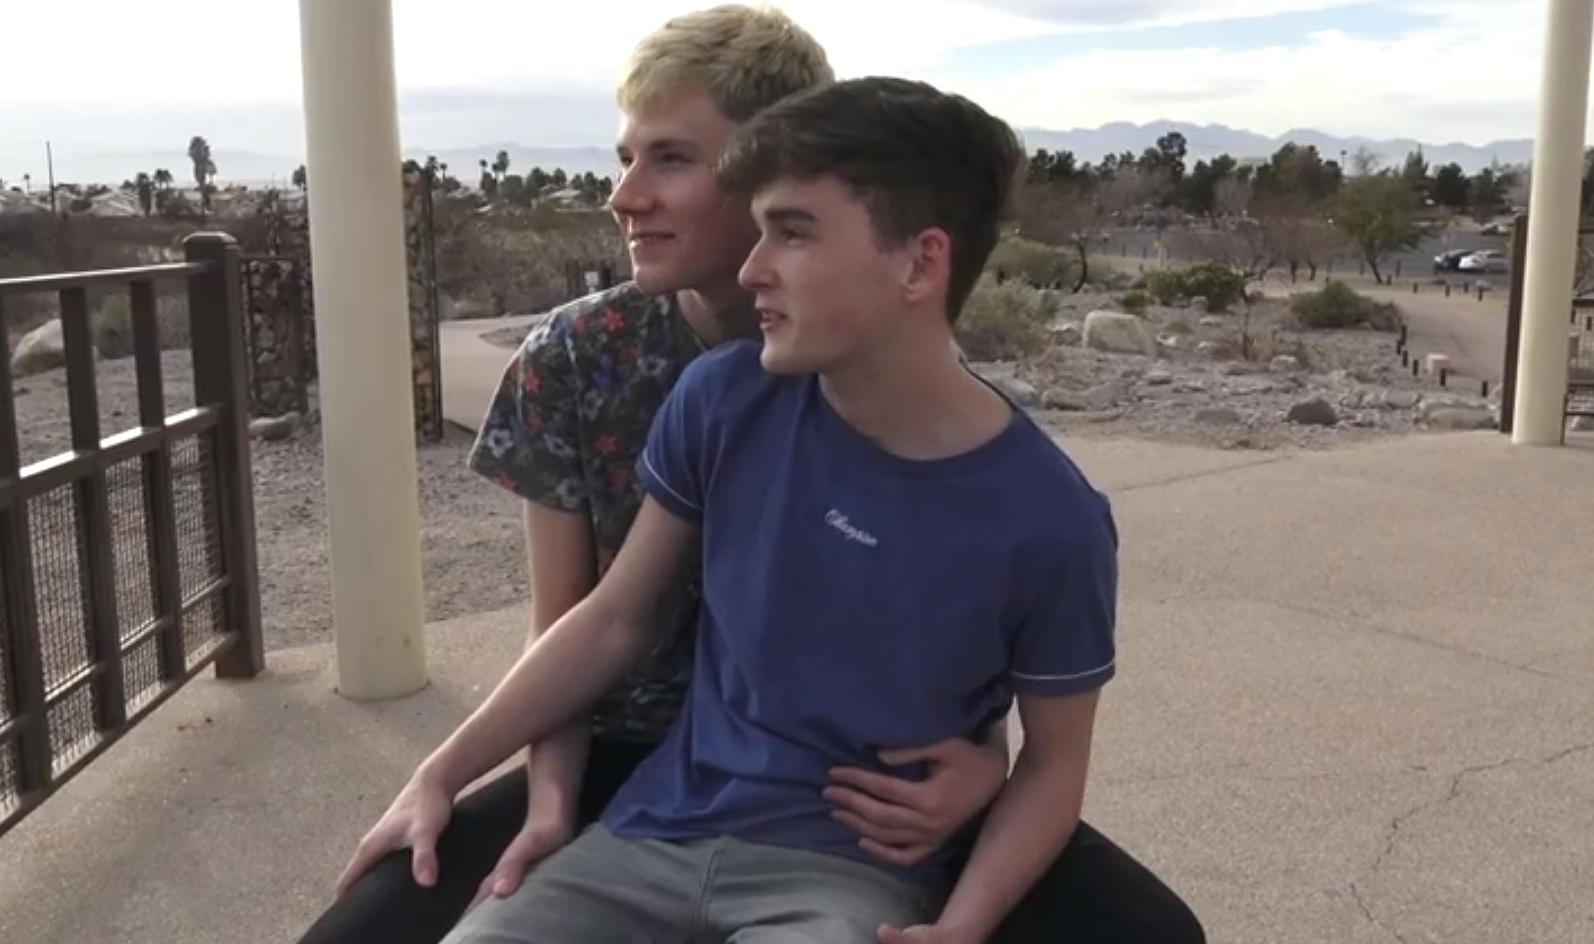 Gay Twink Video